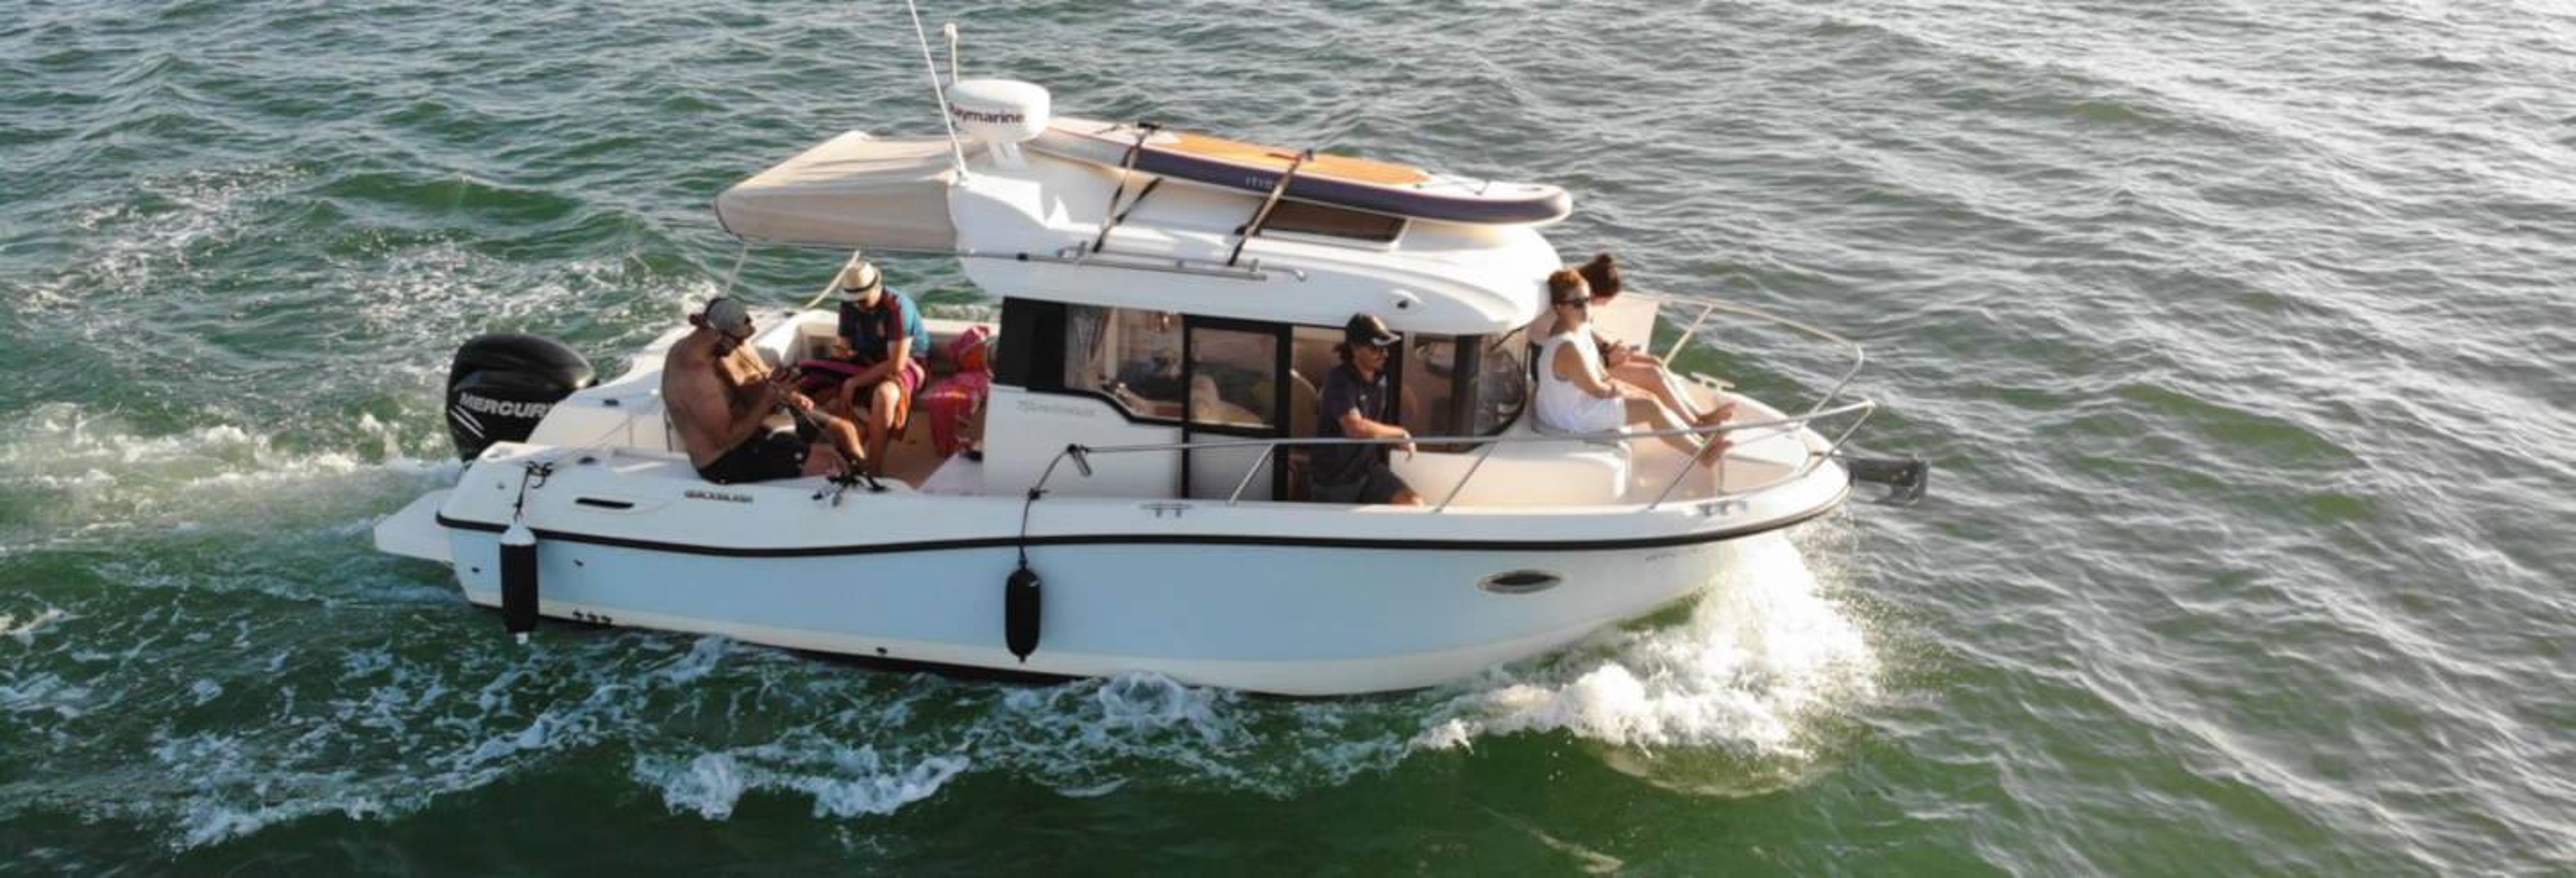 Balade en bateau privé à Cadix